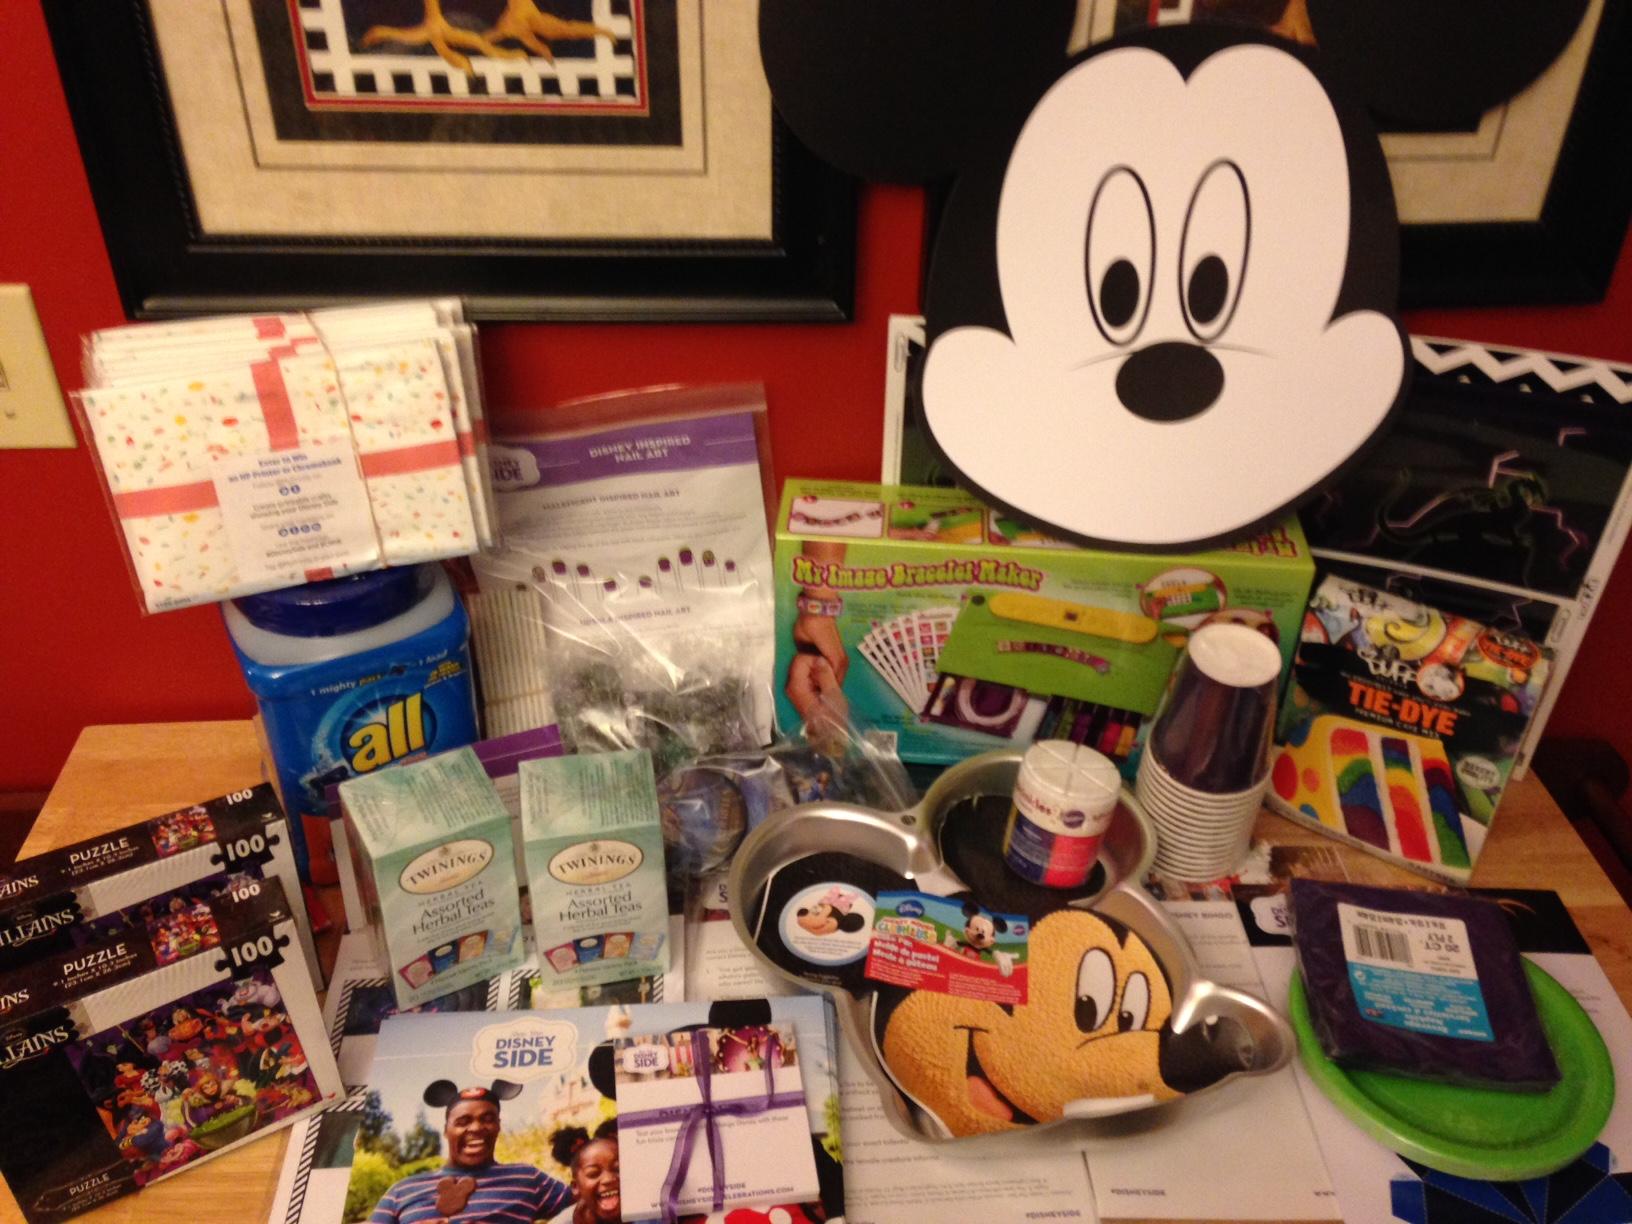 #DisneySide @Home Celebration Villain Party Kit Arrived. Let The Party Planning Begin!